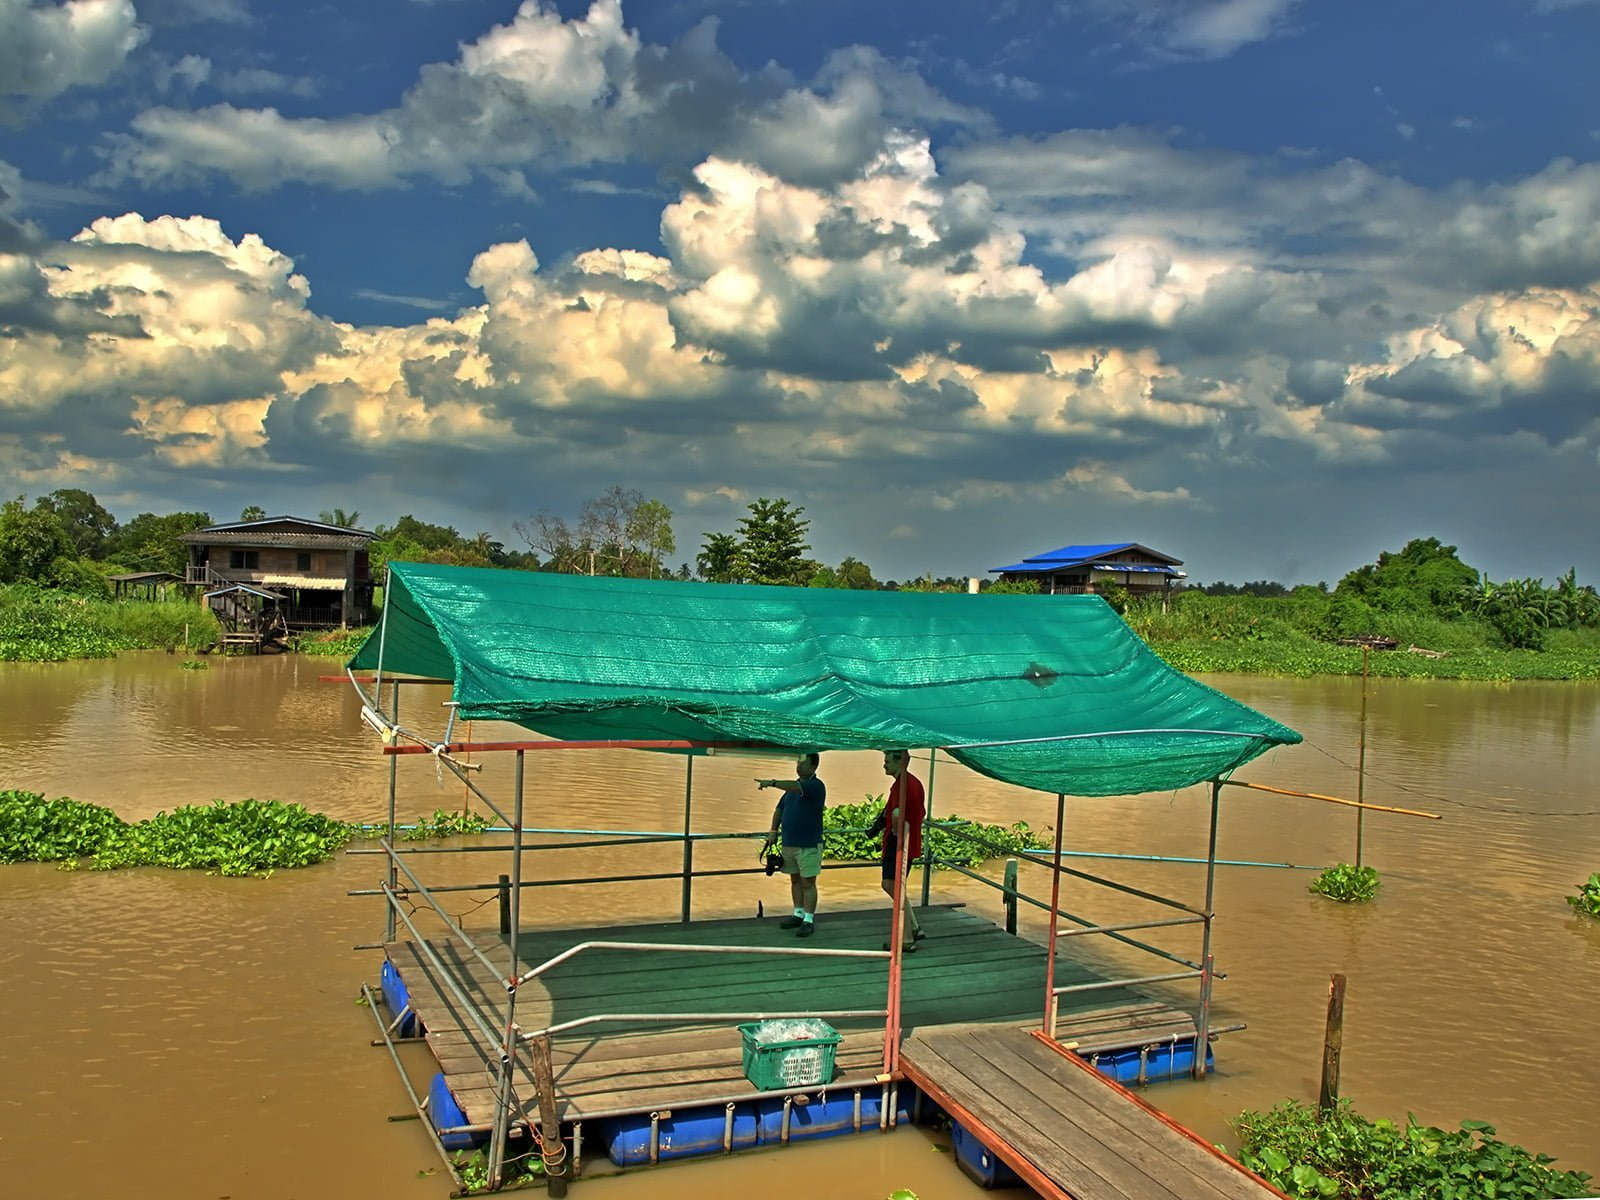 bangkok nehir iskele